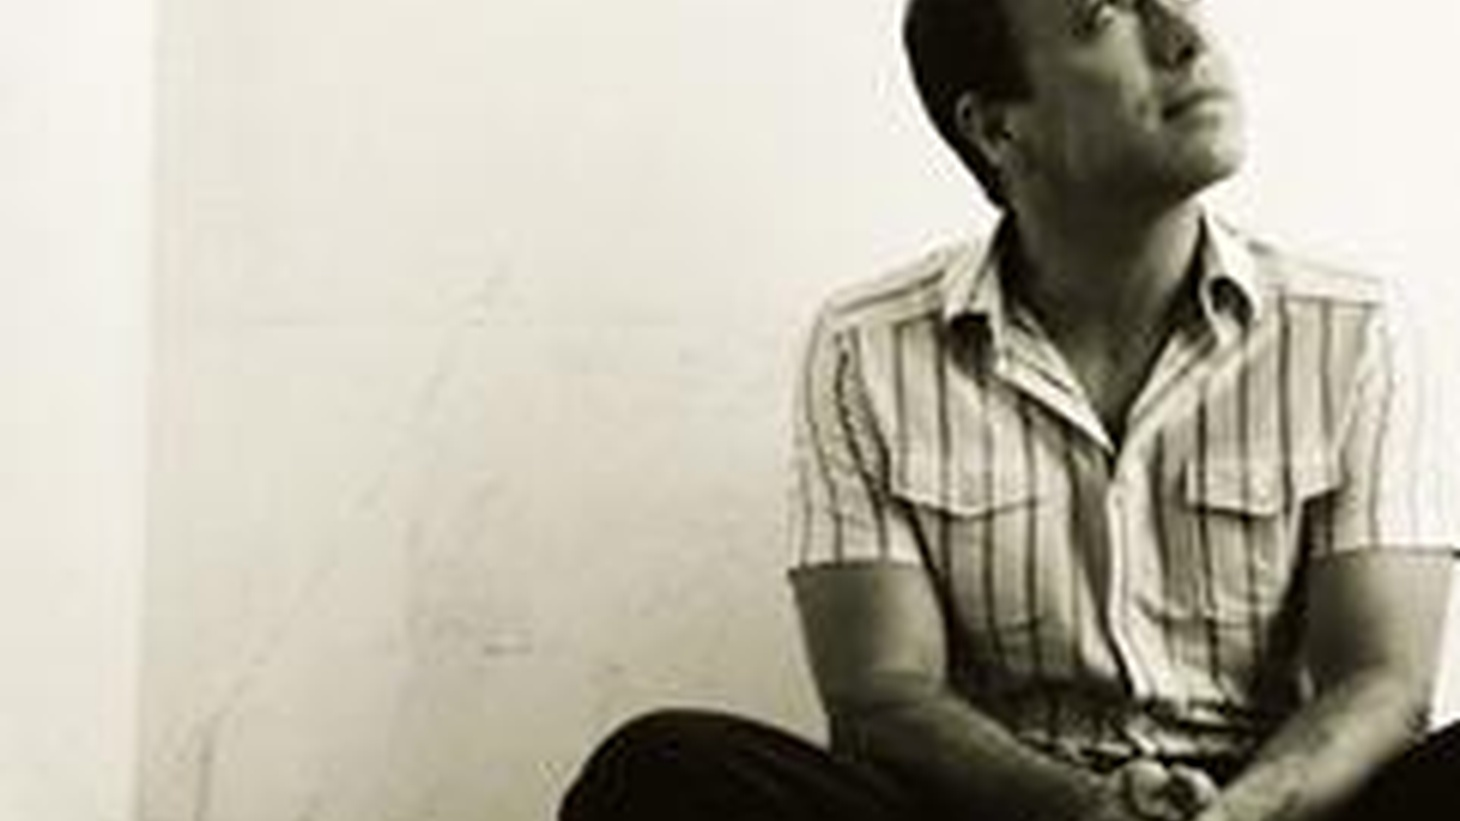 New York jazz trio, Medeski, Martin & Wood perform their material, live.